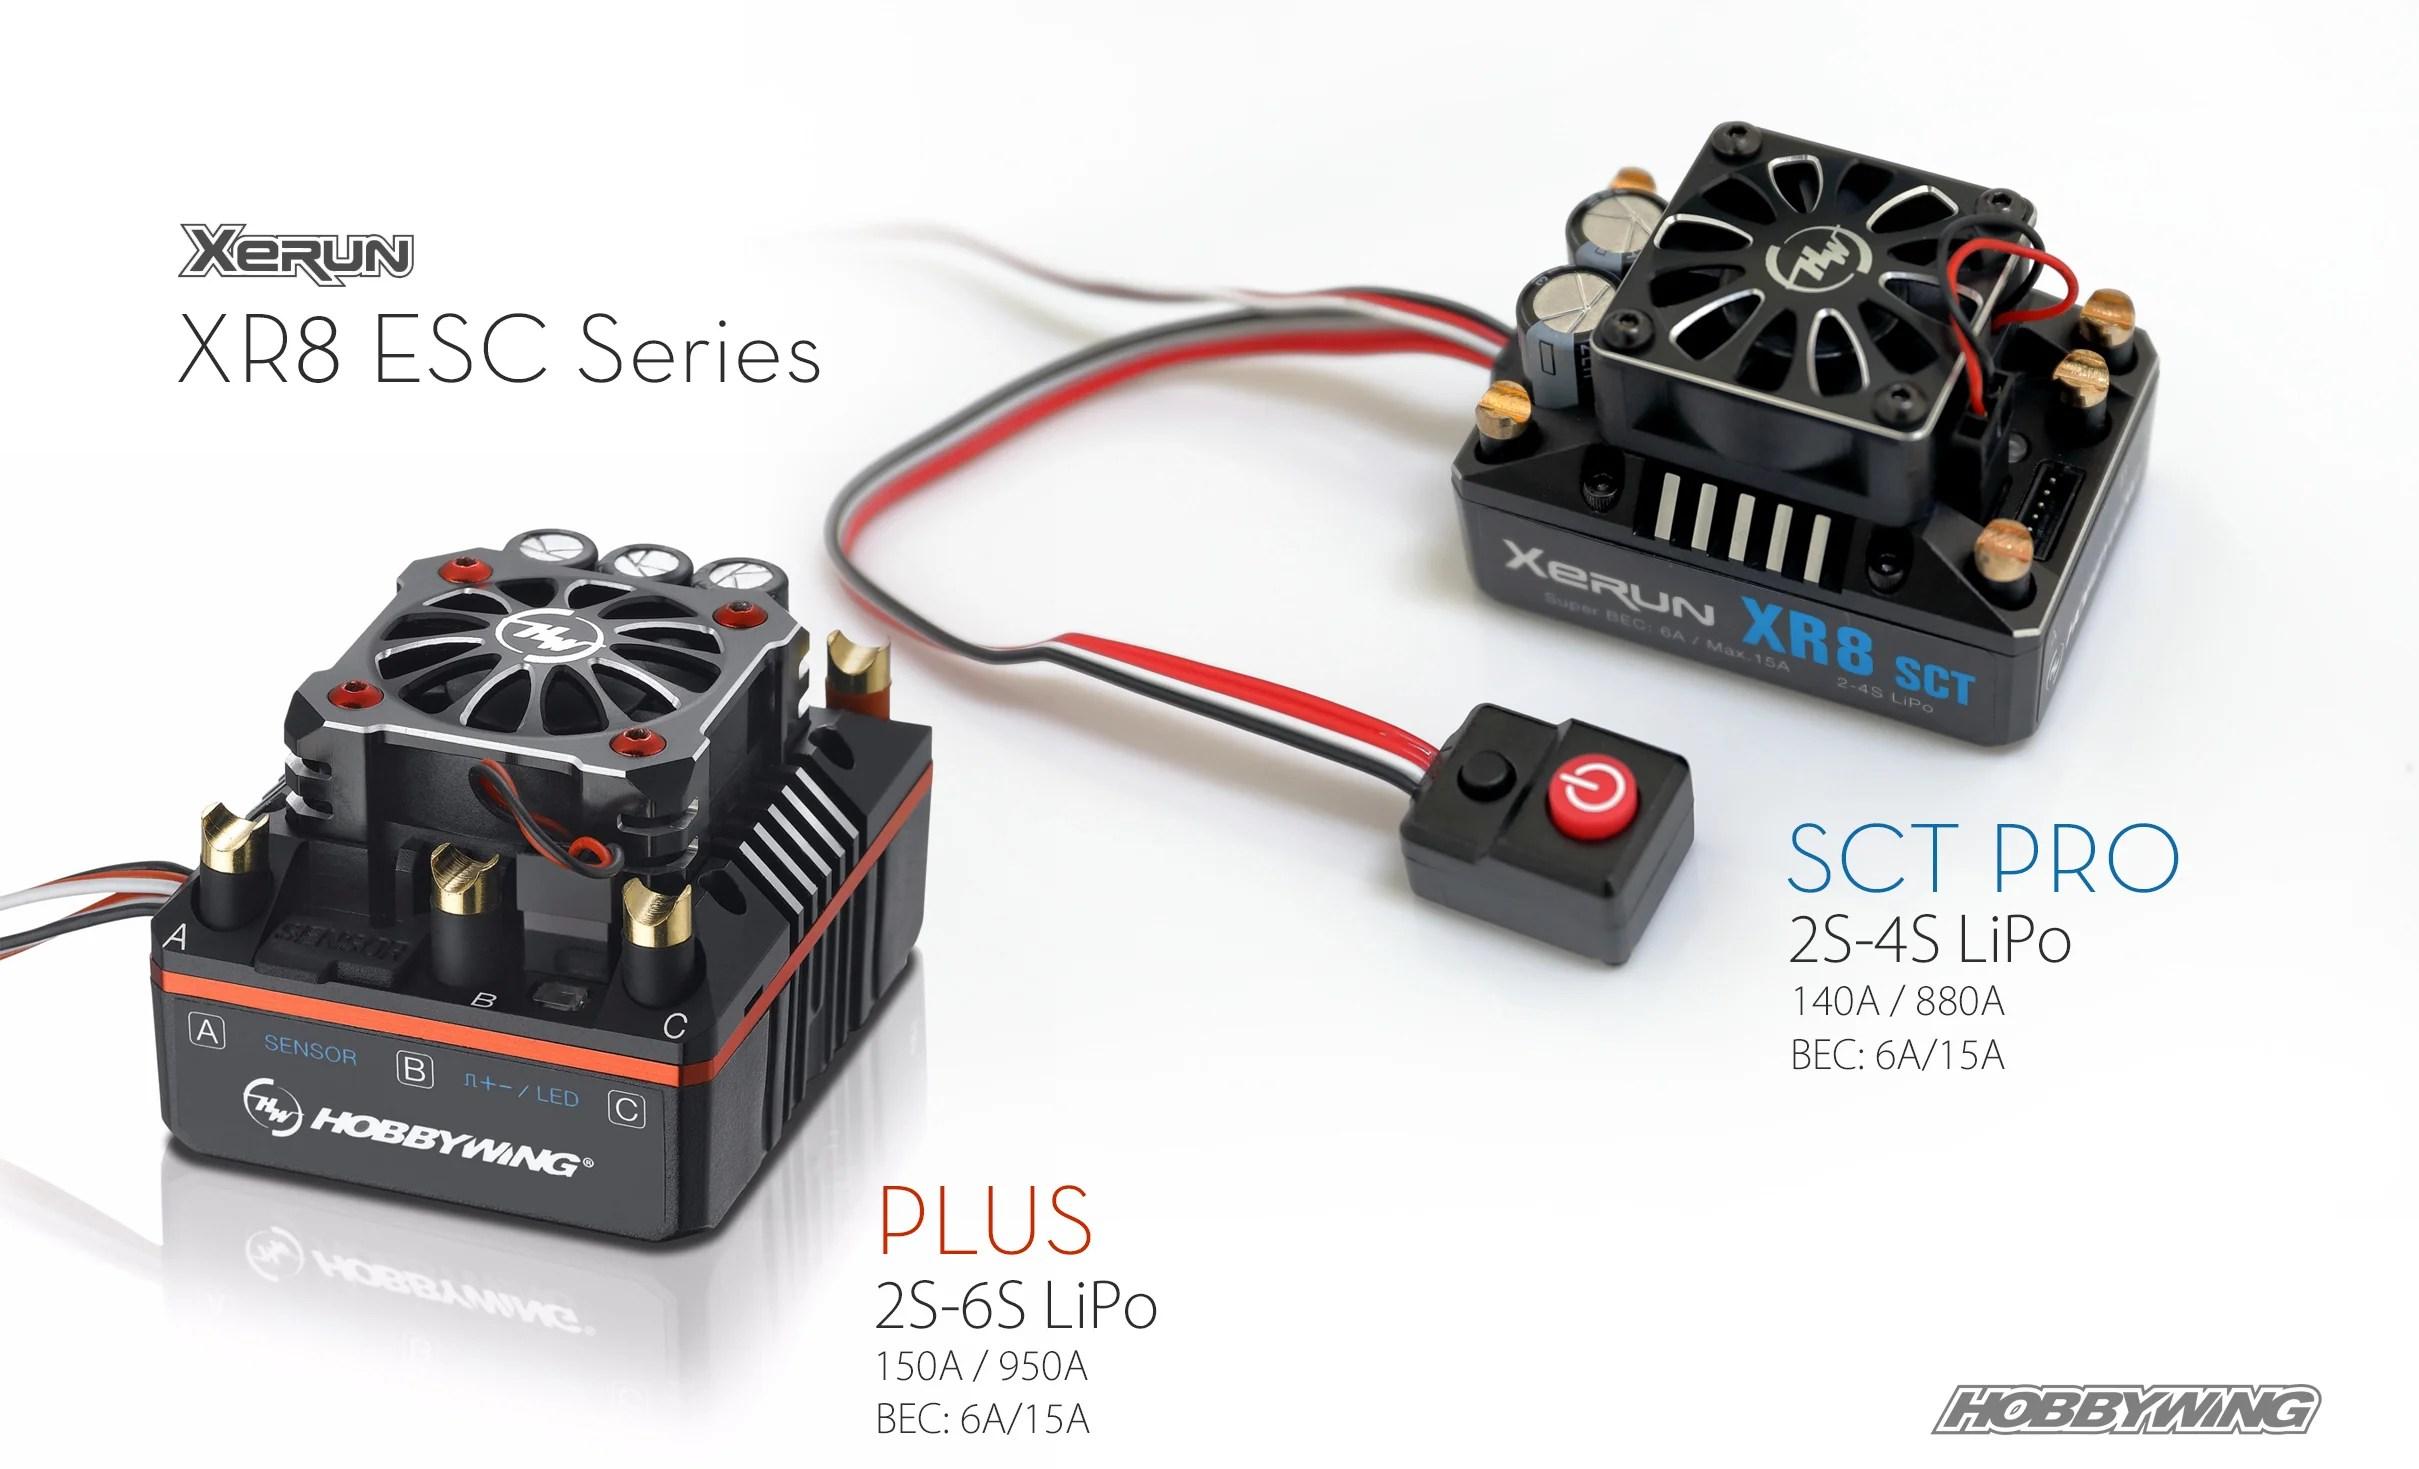 medium resolution of xerun xr8 esc series hobbywing north america north american edition electrical wiring harness with eicv escv